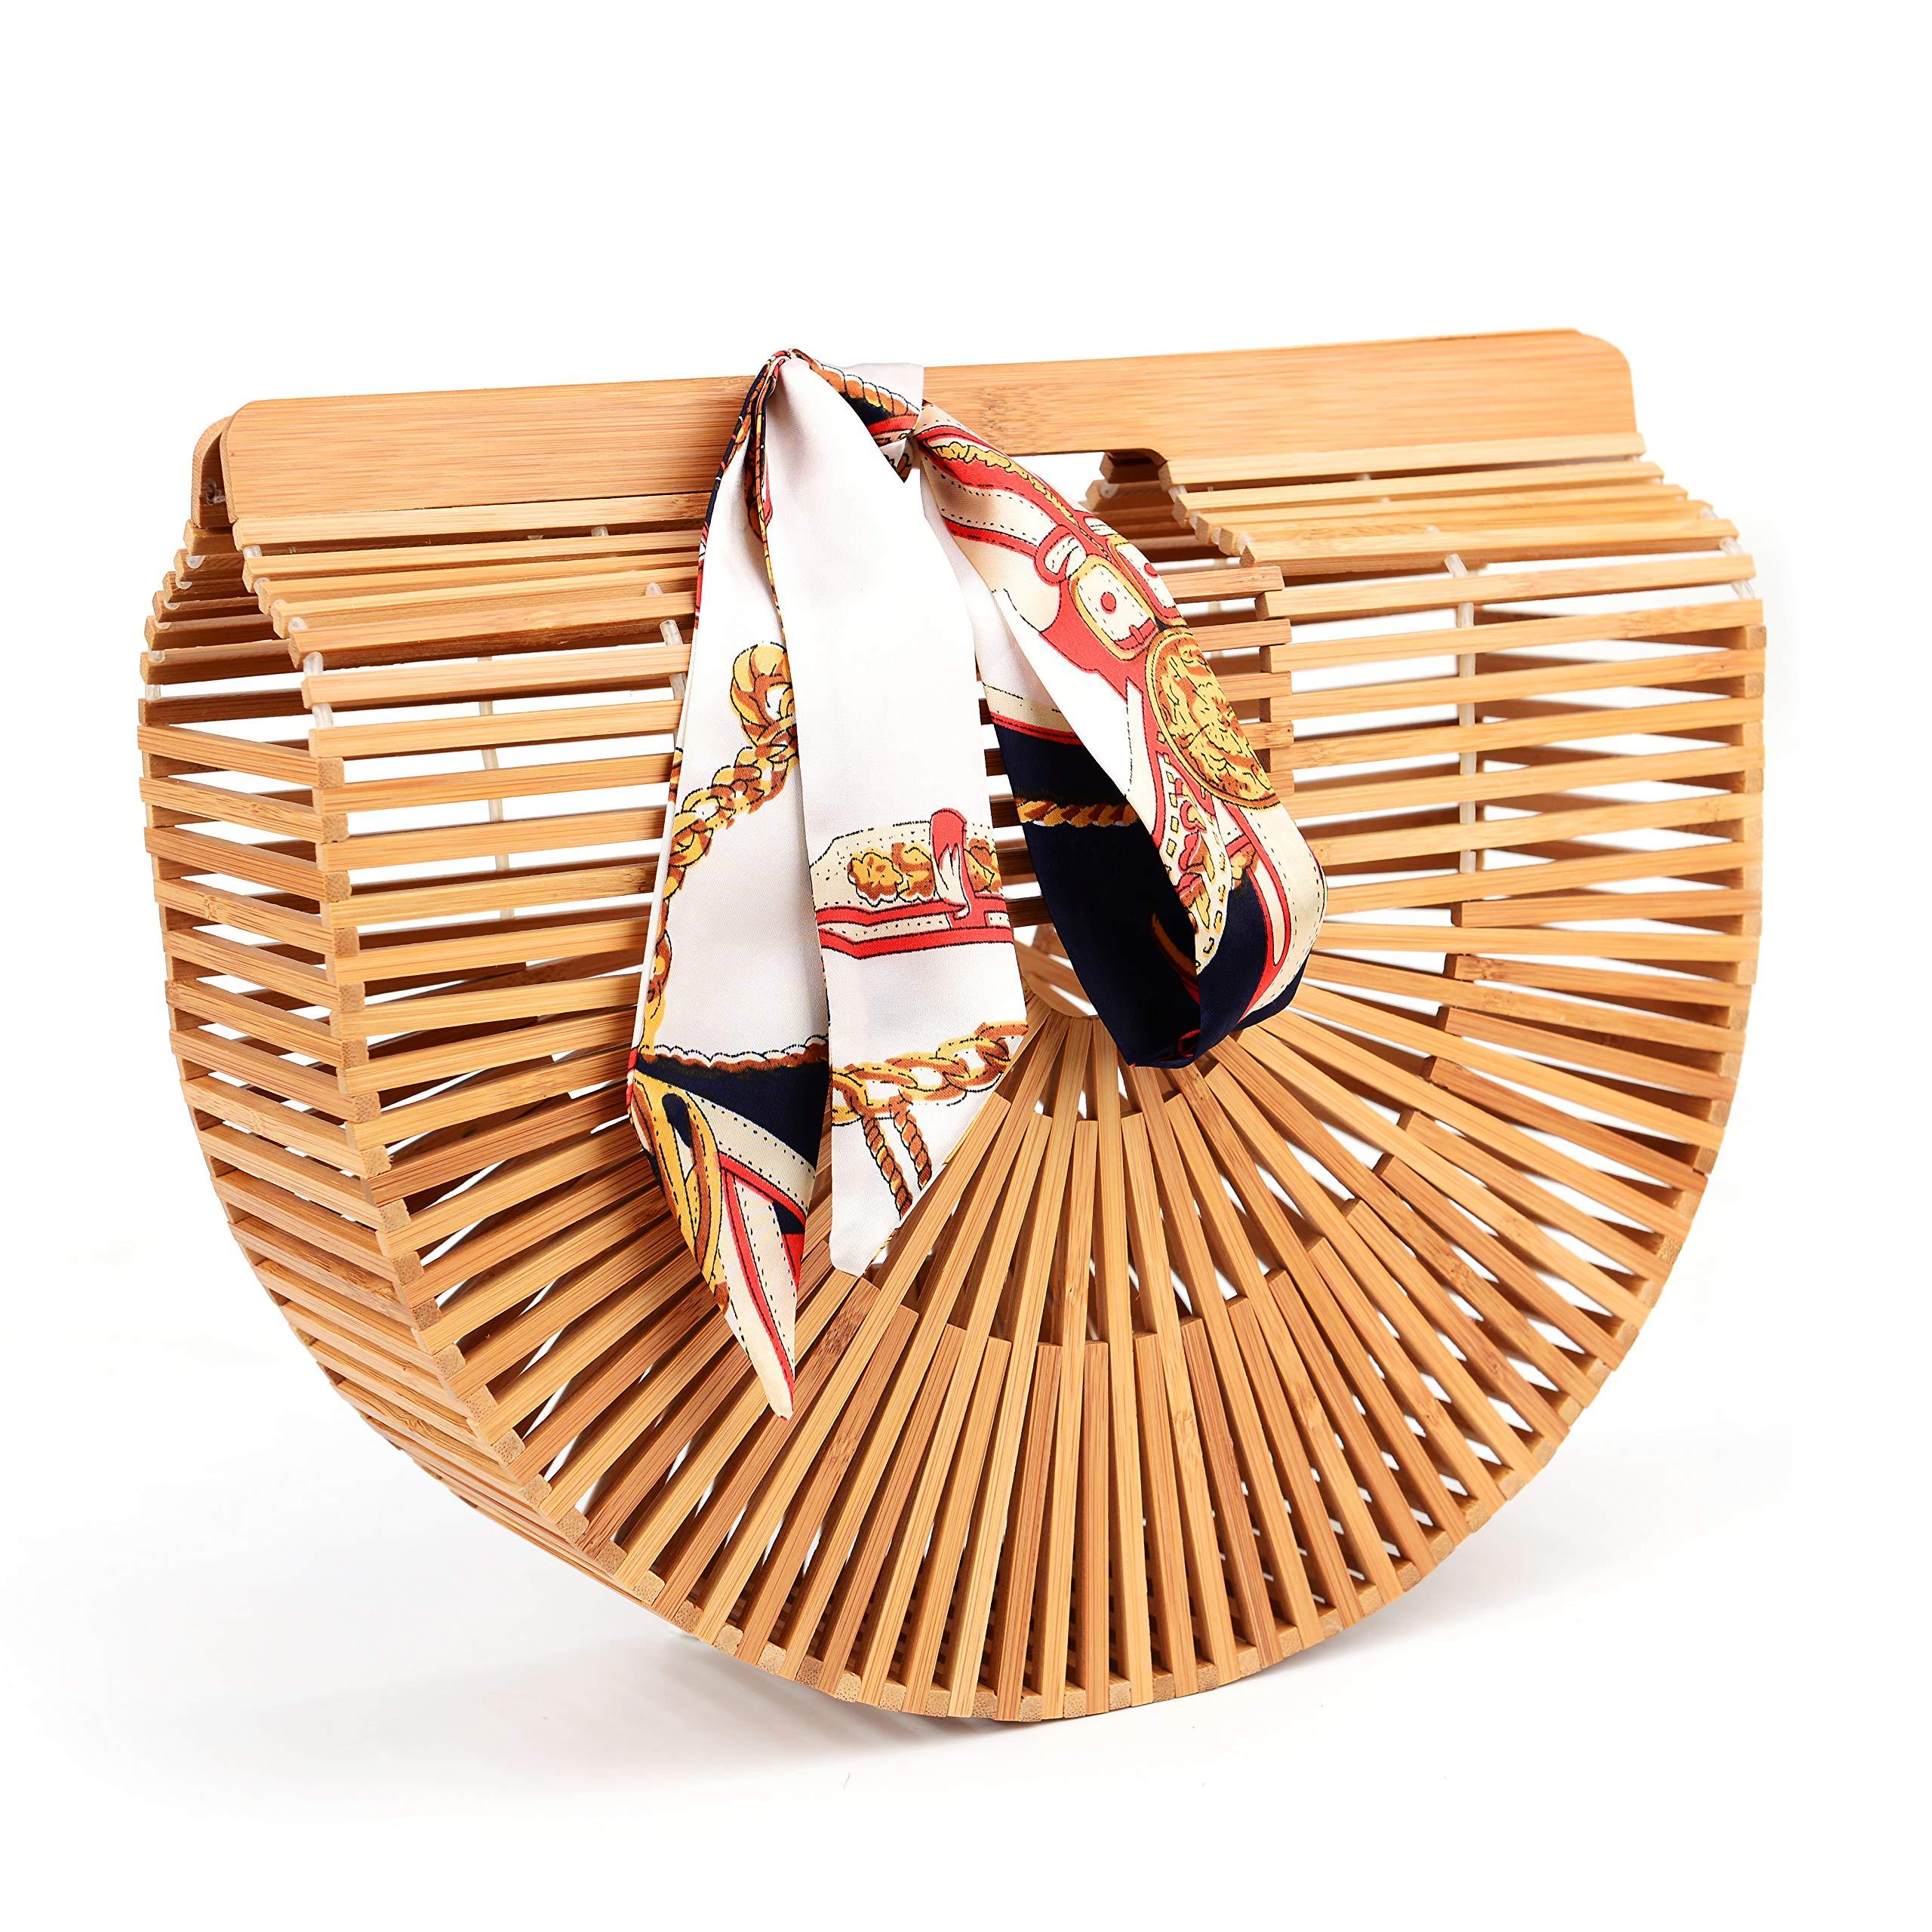 "Bamboo Handbag Handmade Tote Bag Handle Straw Beach Bag for Women By Samuel (12.59"" x 3.93"" x 10.63"")"